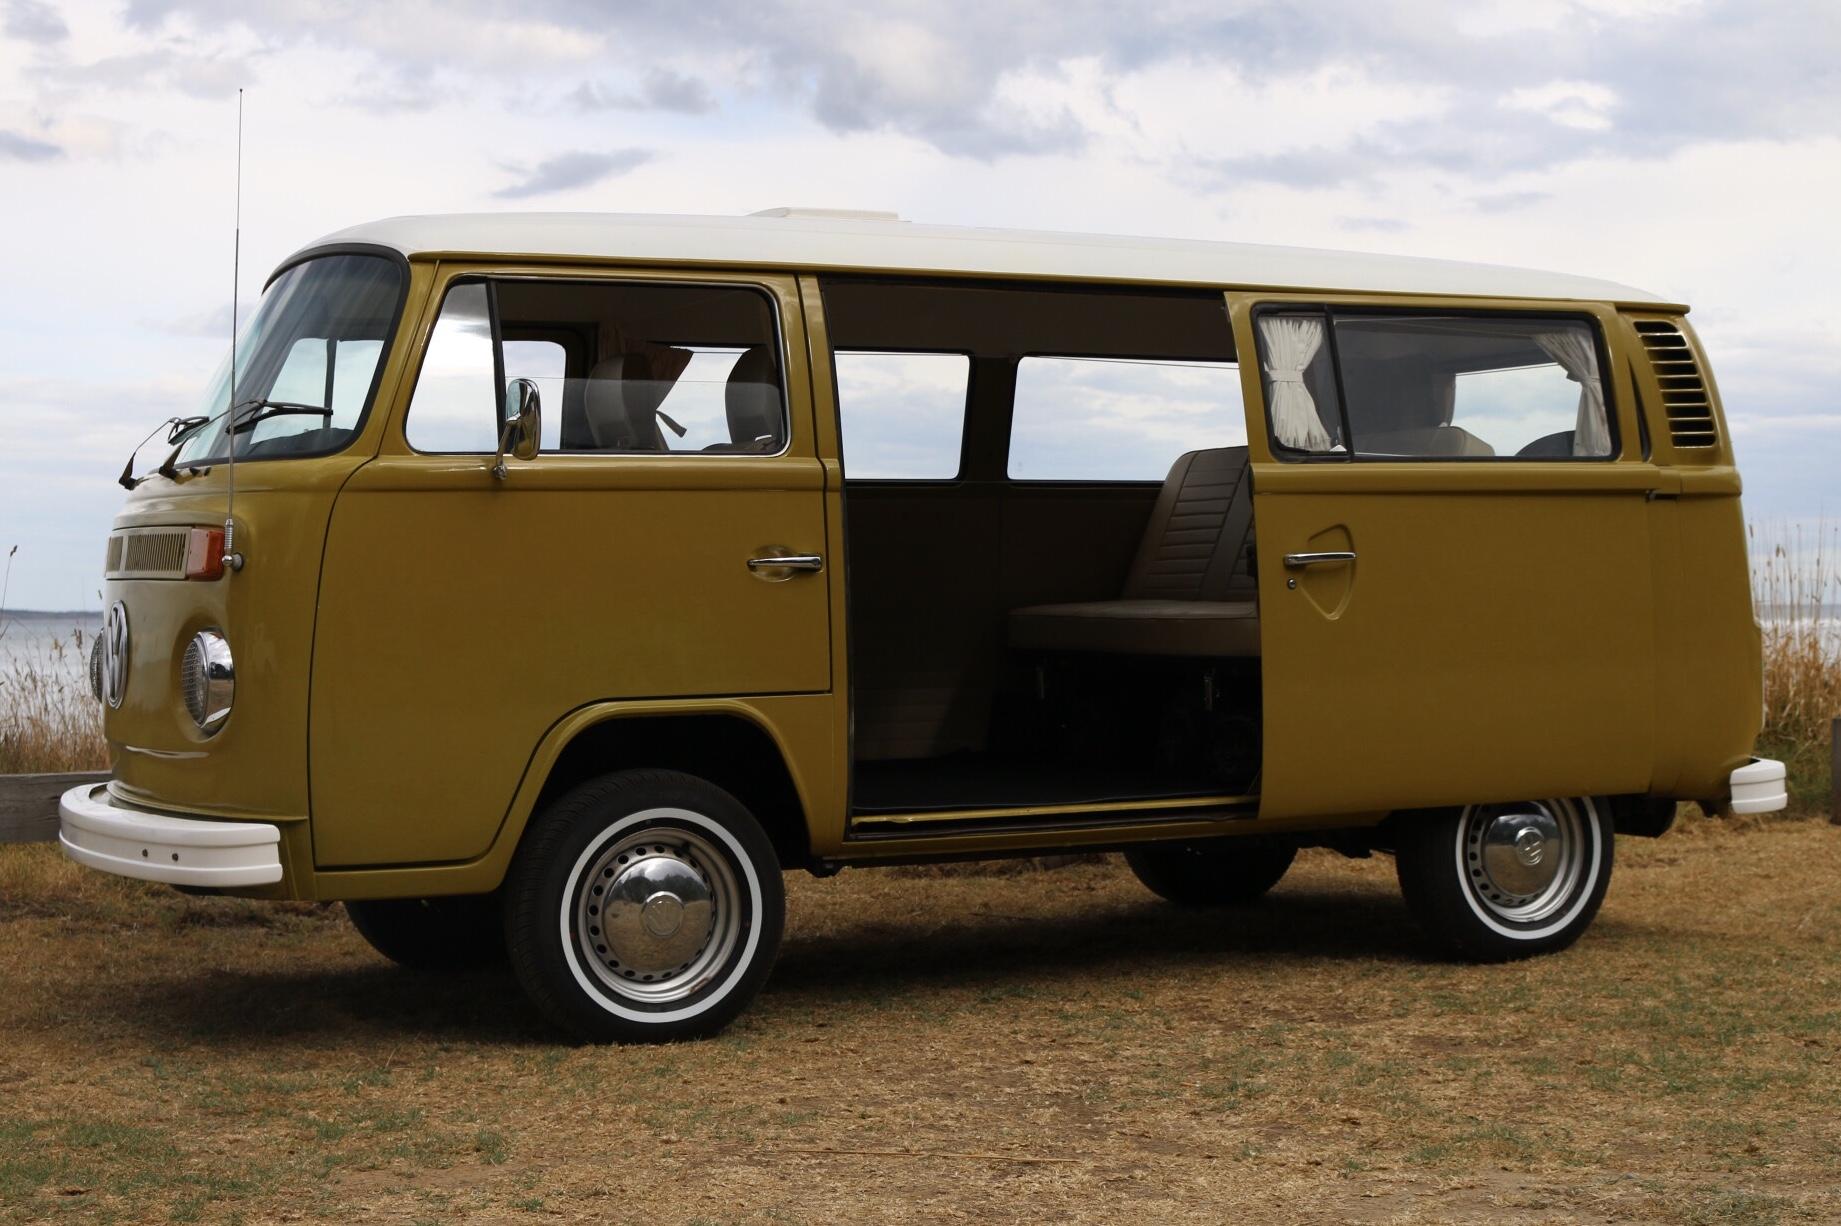 Volkswagen Kombi Cars for sale in Australia - JUST CARS